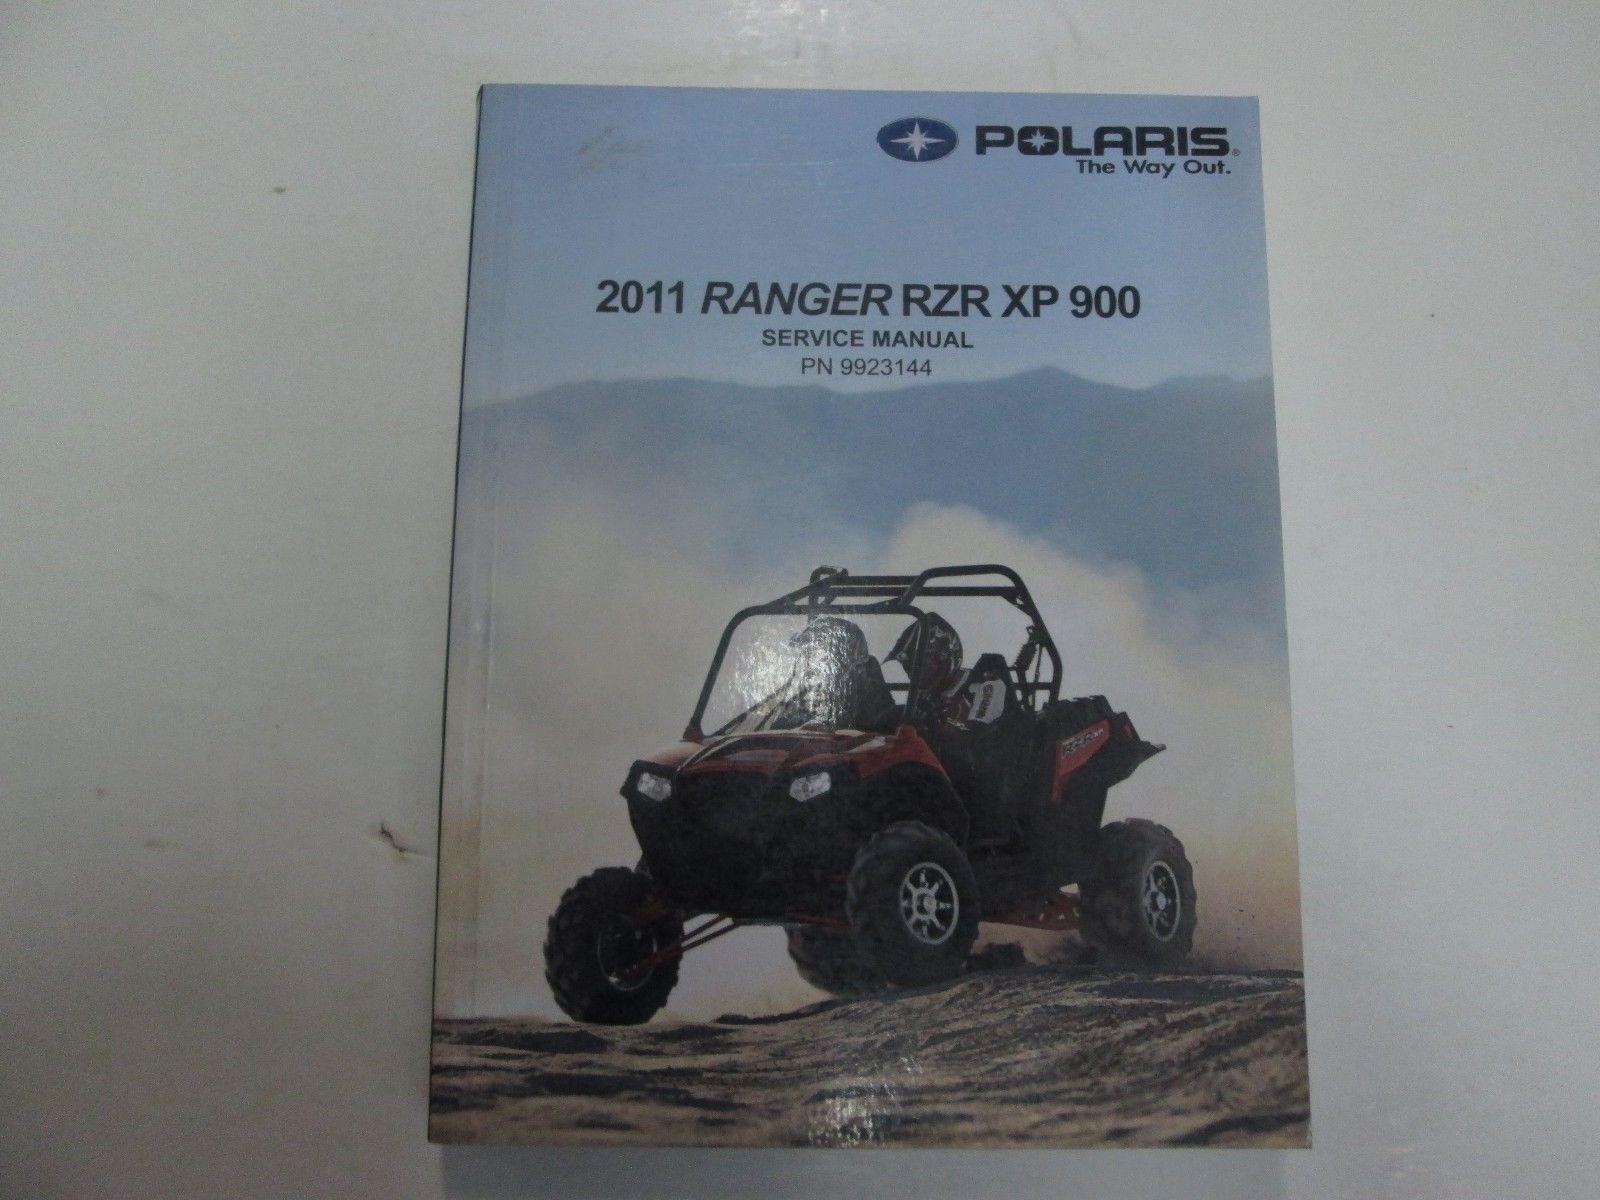 2011 polaris ranger rzr xp 900 service shop and 50 similar items rh bonanza com 2013 rzr xp 900 service manual 2013 rzr xp 900 service manual